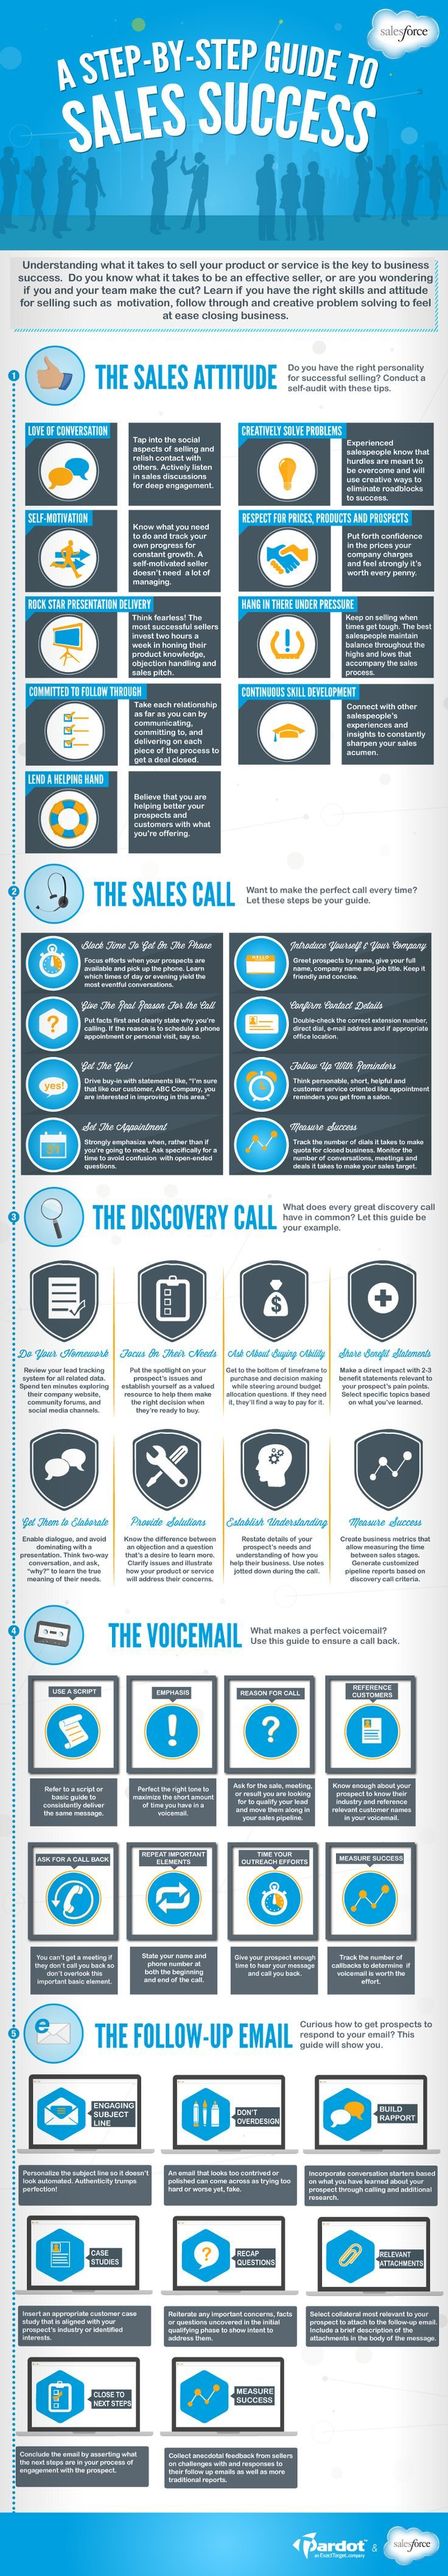 Salesforce -  27 Incredible Sales Tips